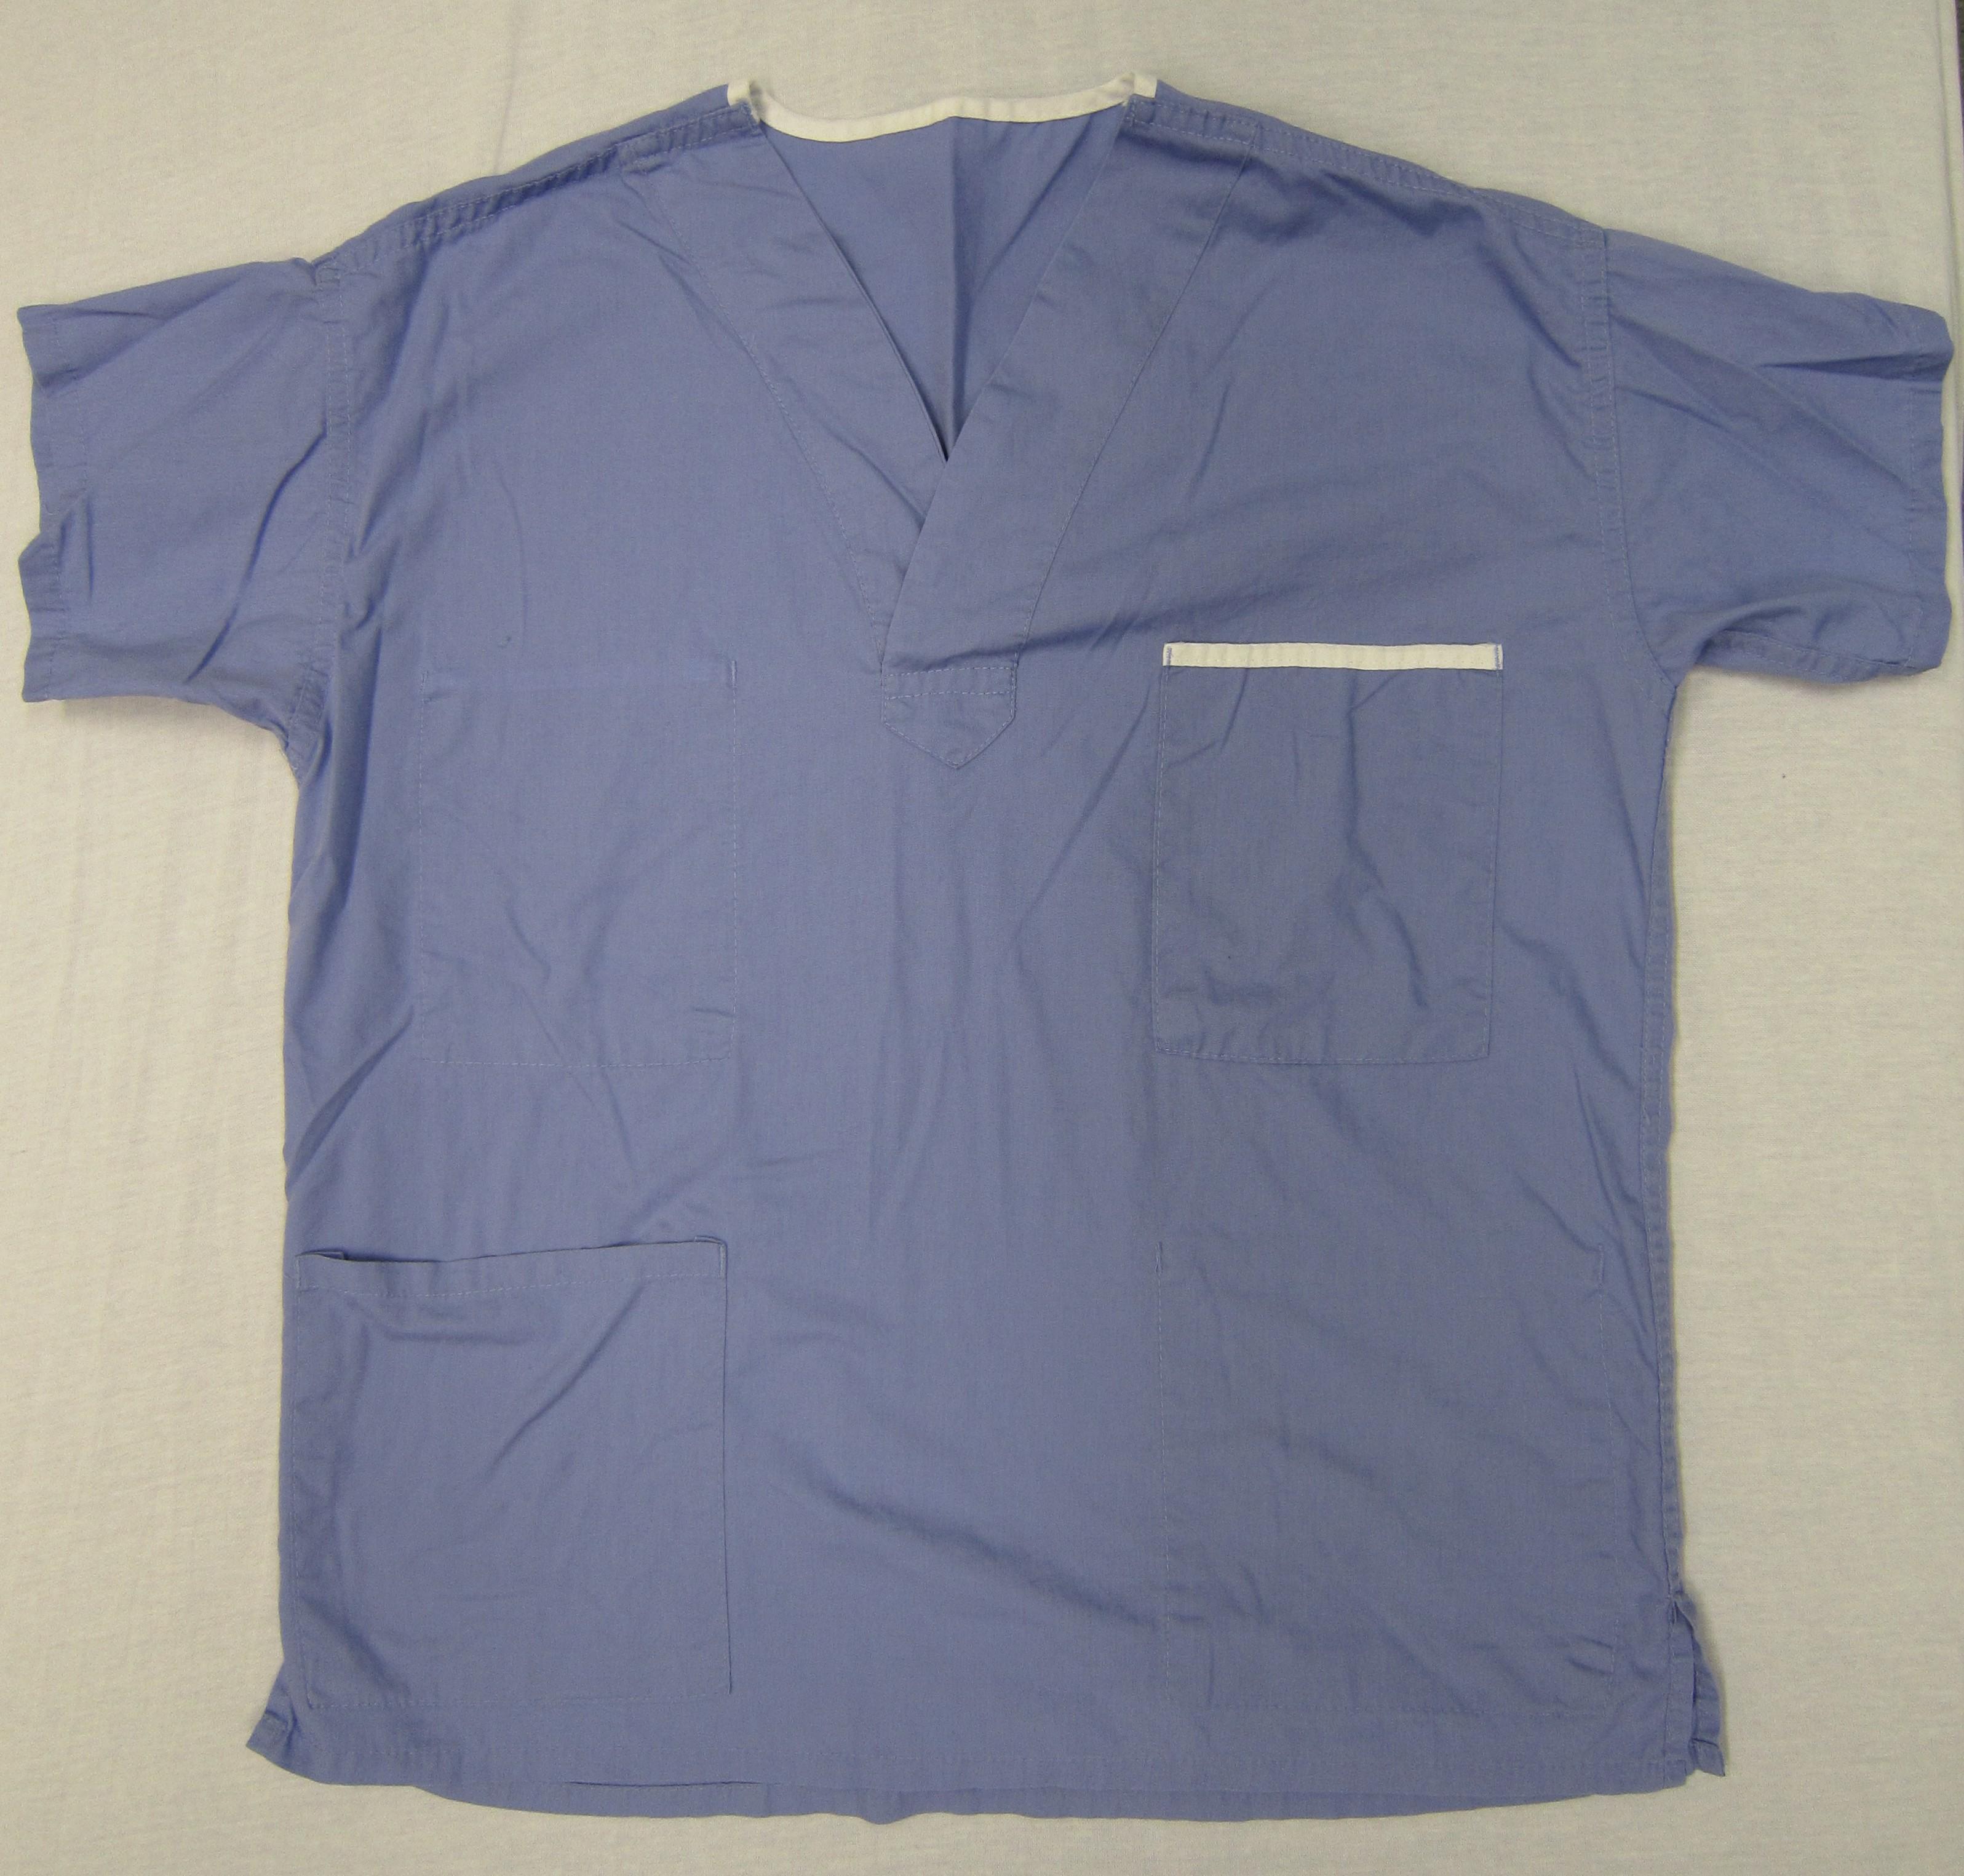 Scrubs Clothing Wikiwand